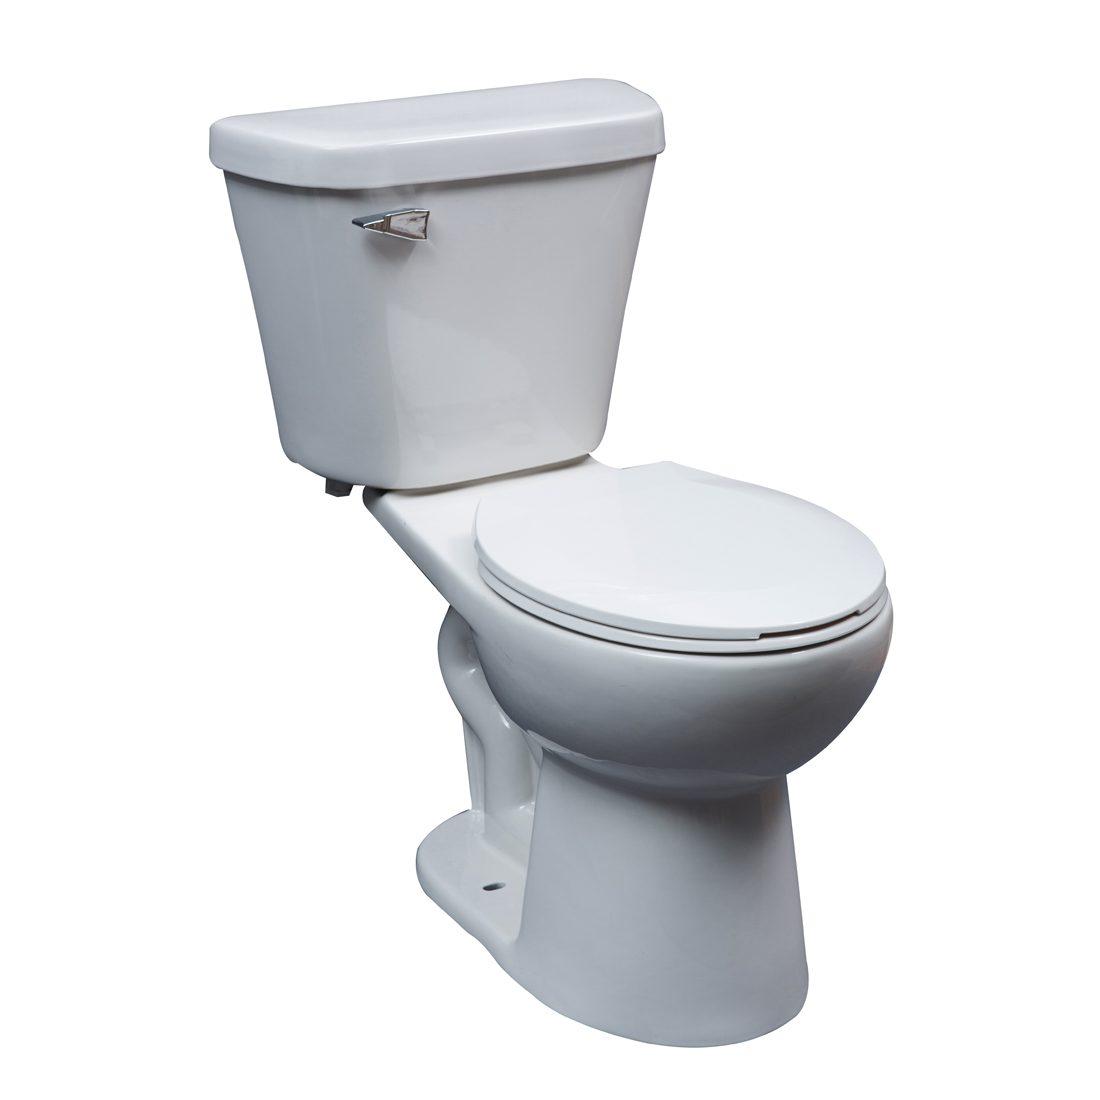 Portland Toilet 16.5inch 6L White Front View